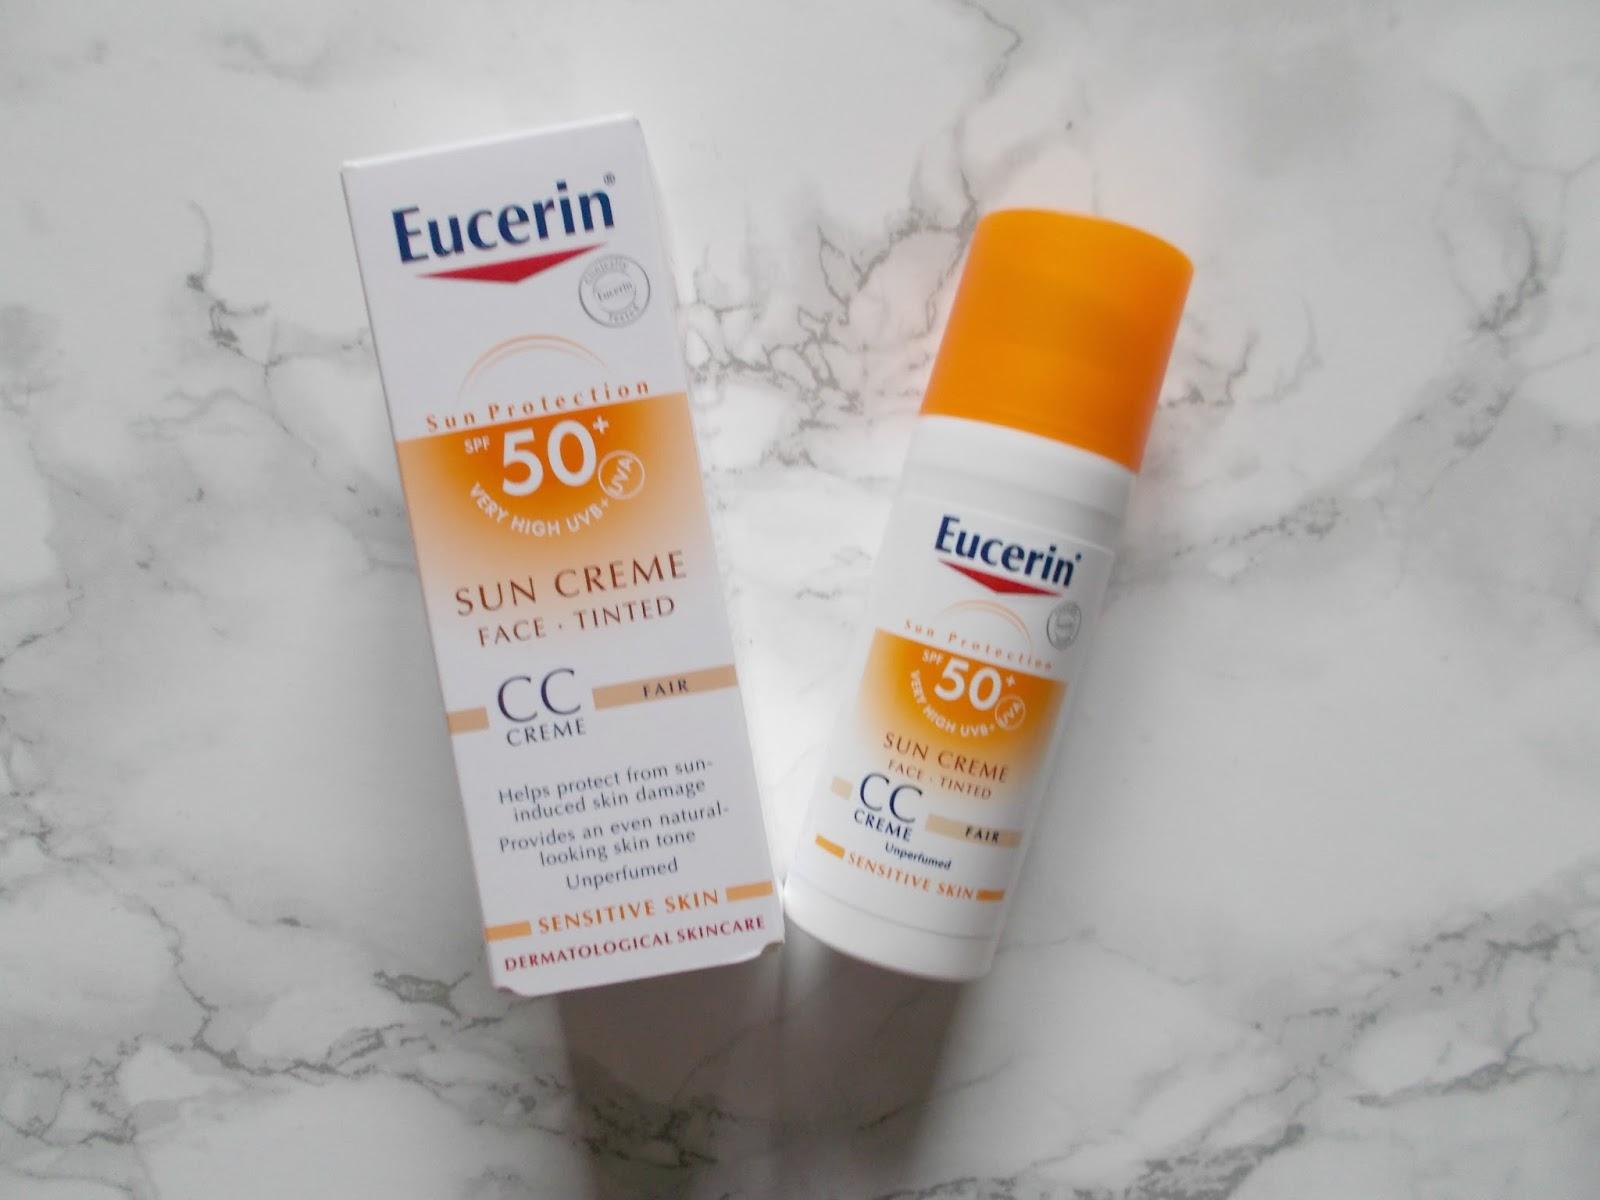 Eucerin spf 50 sun cream cc cream fair tinted